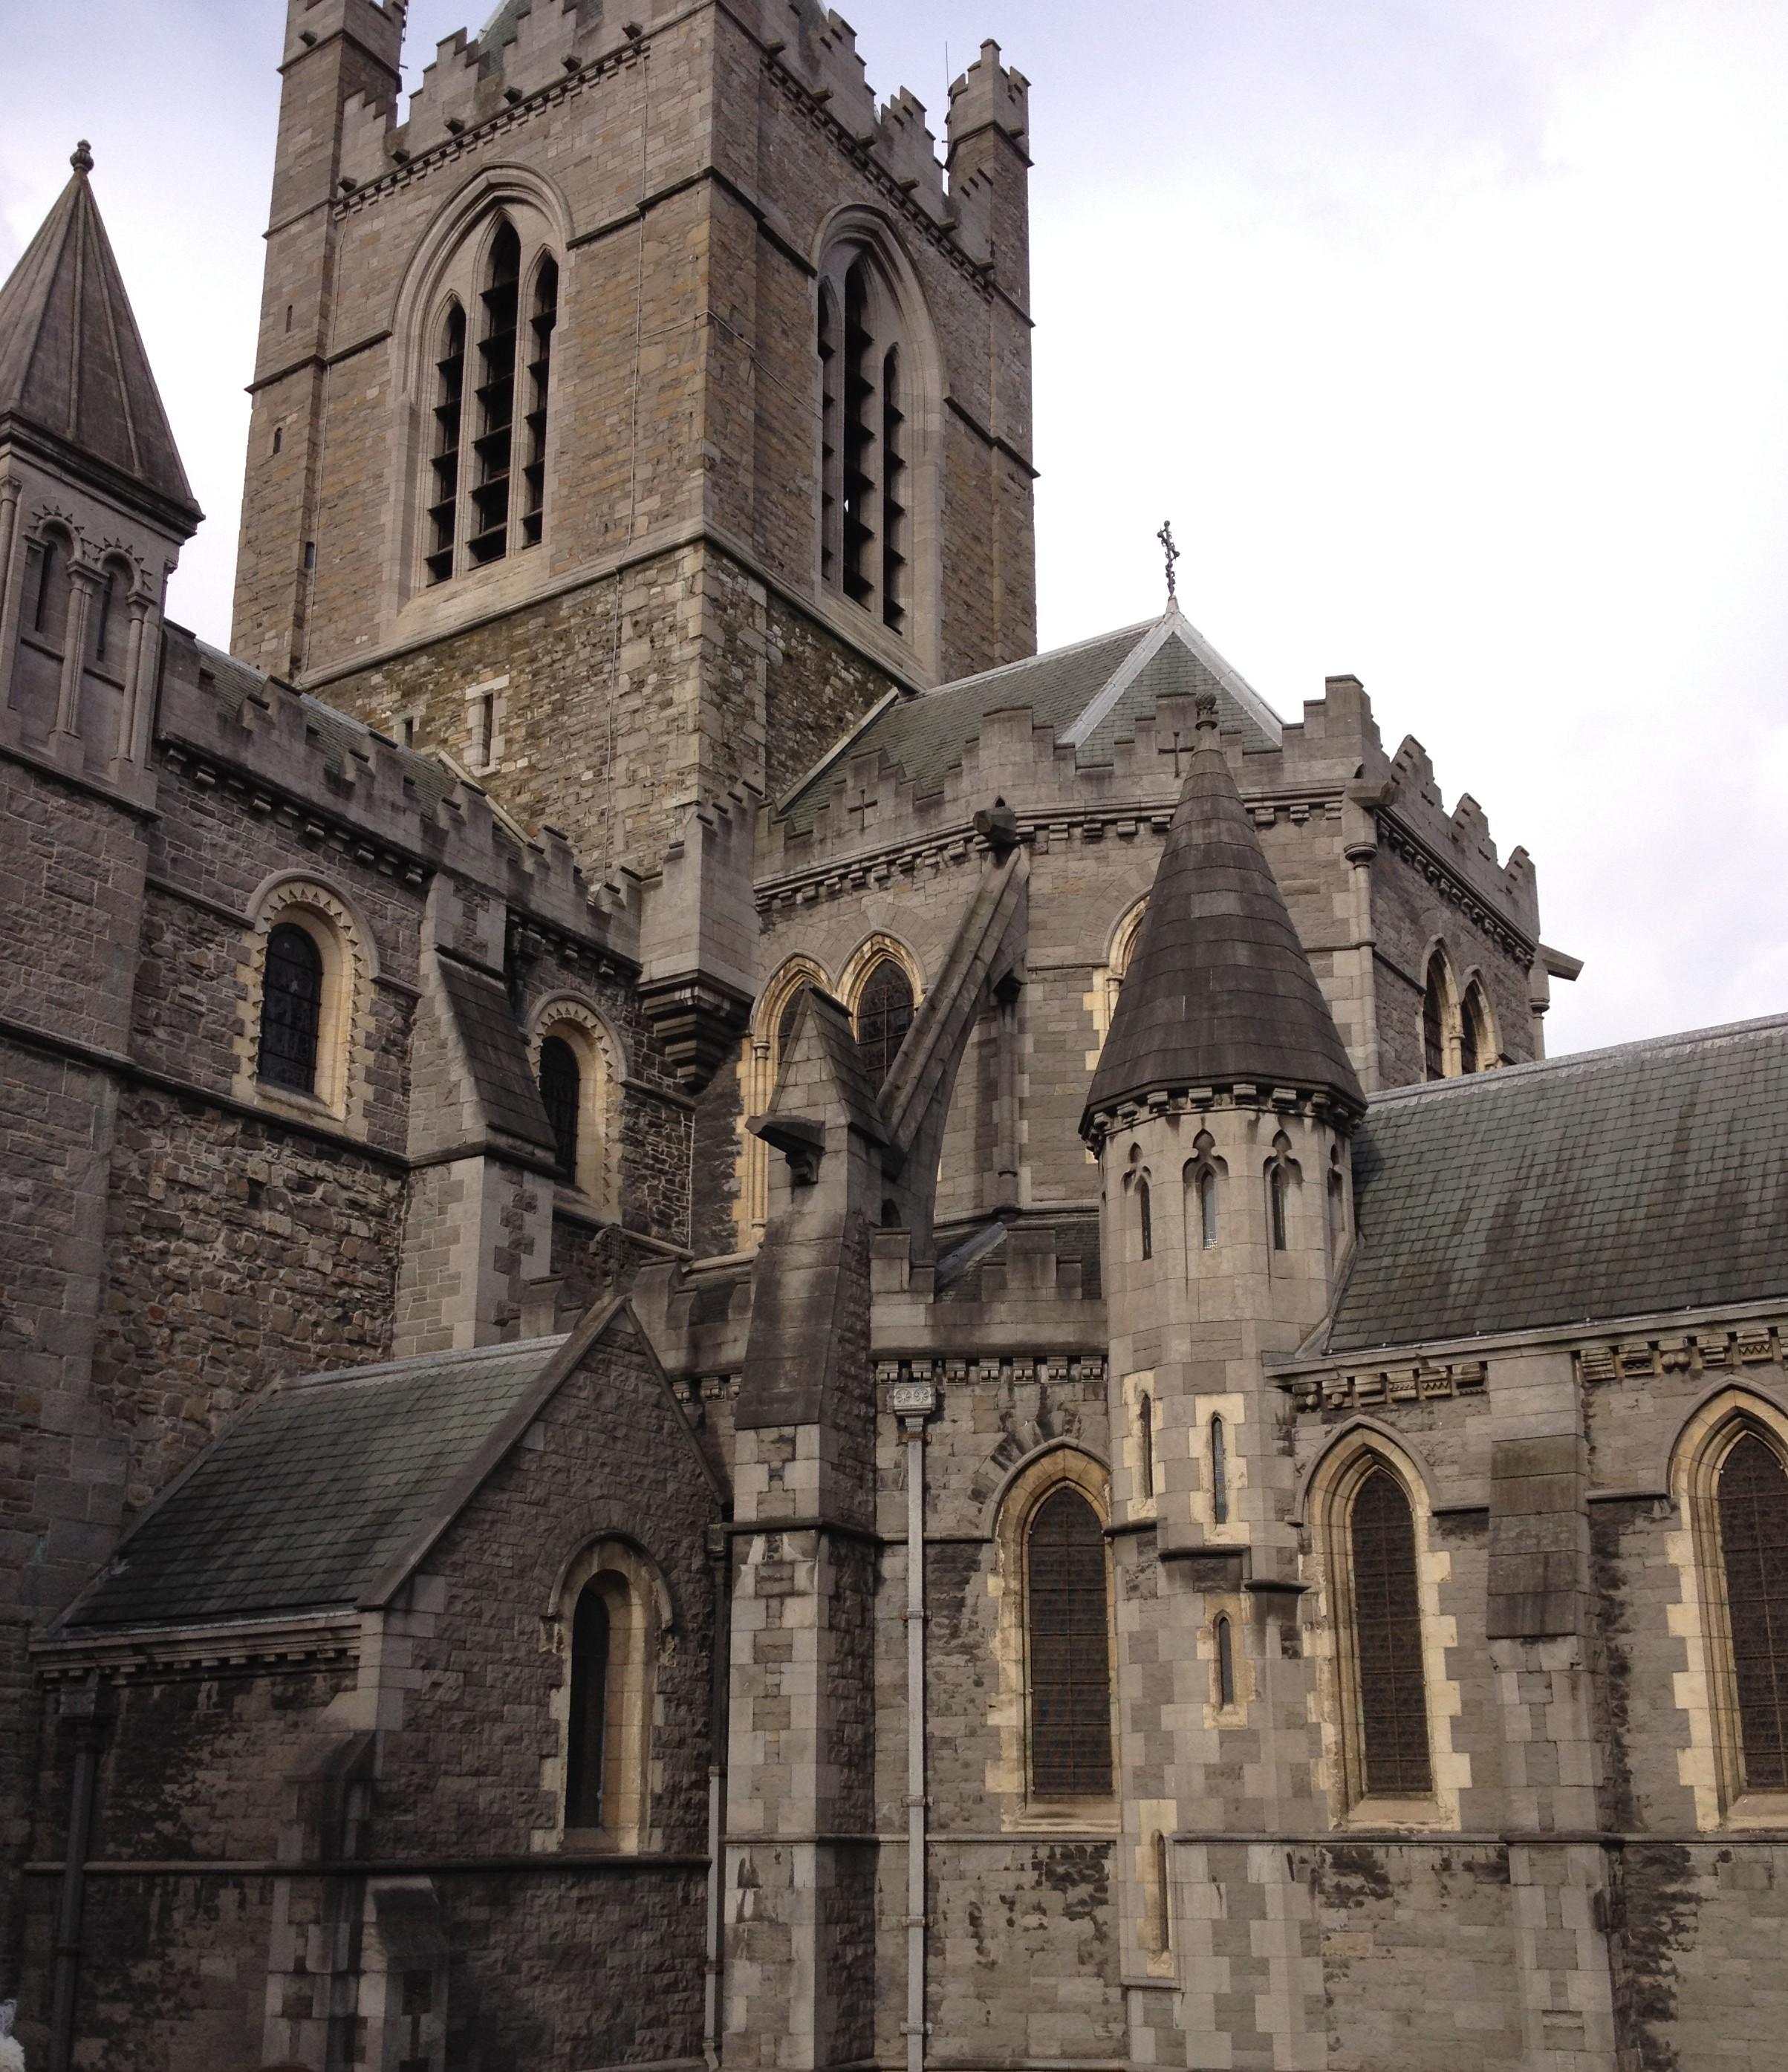 San Patricio, catedral, Dublín, Irlanda, turismo, que ver